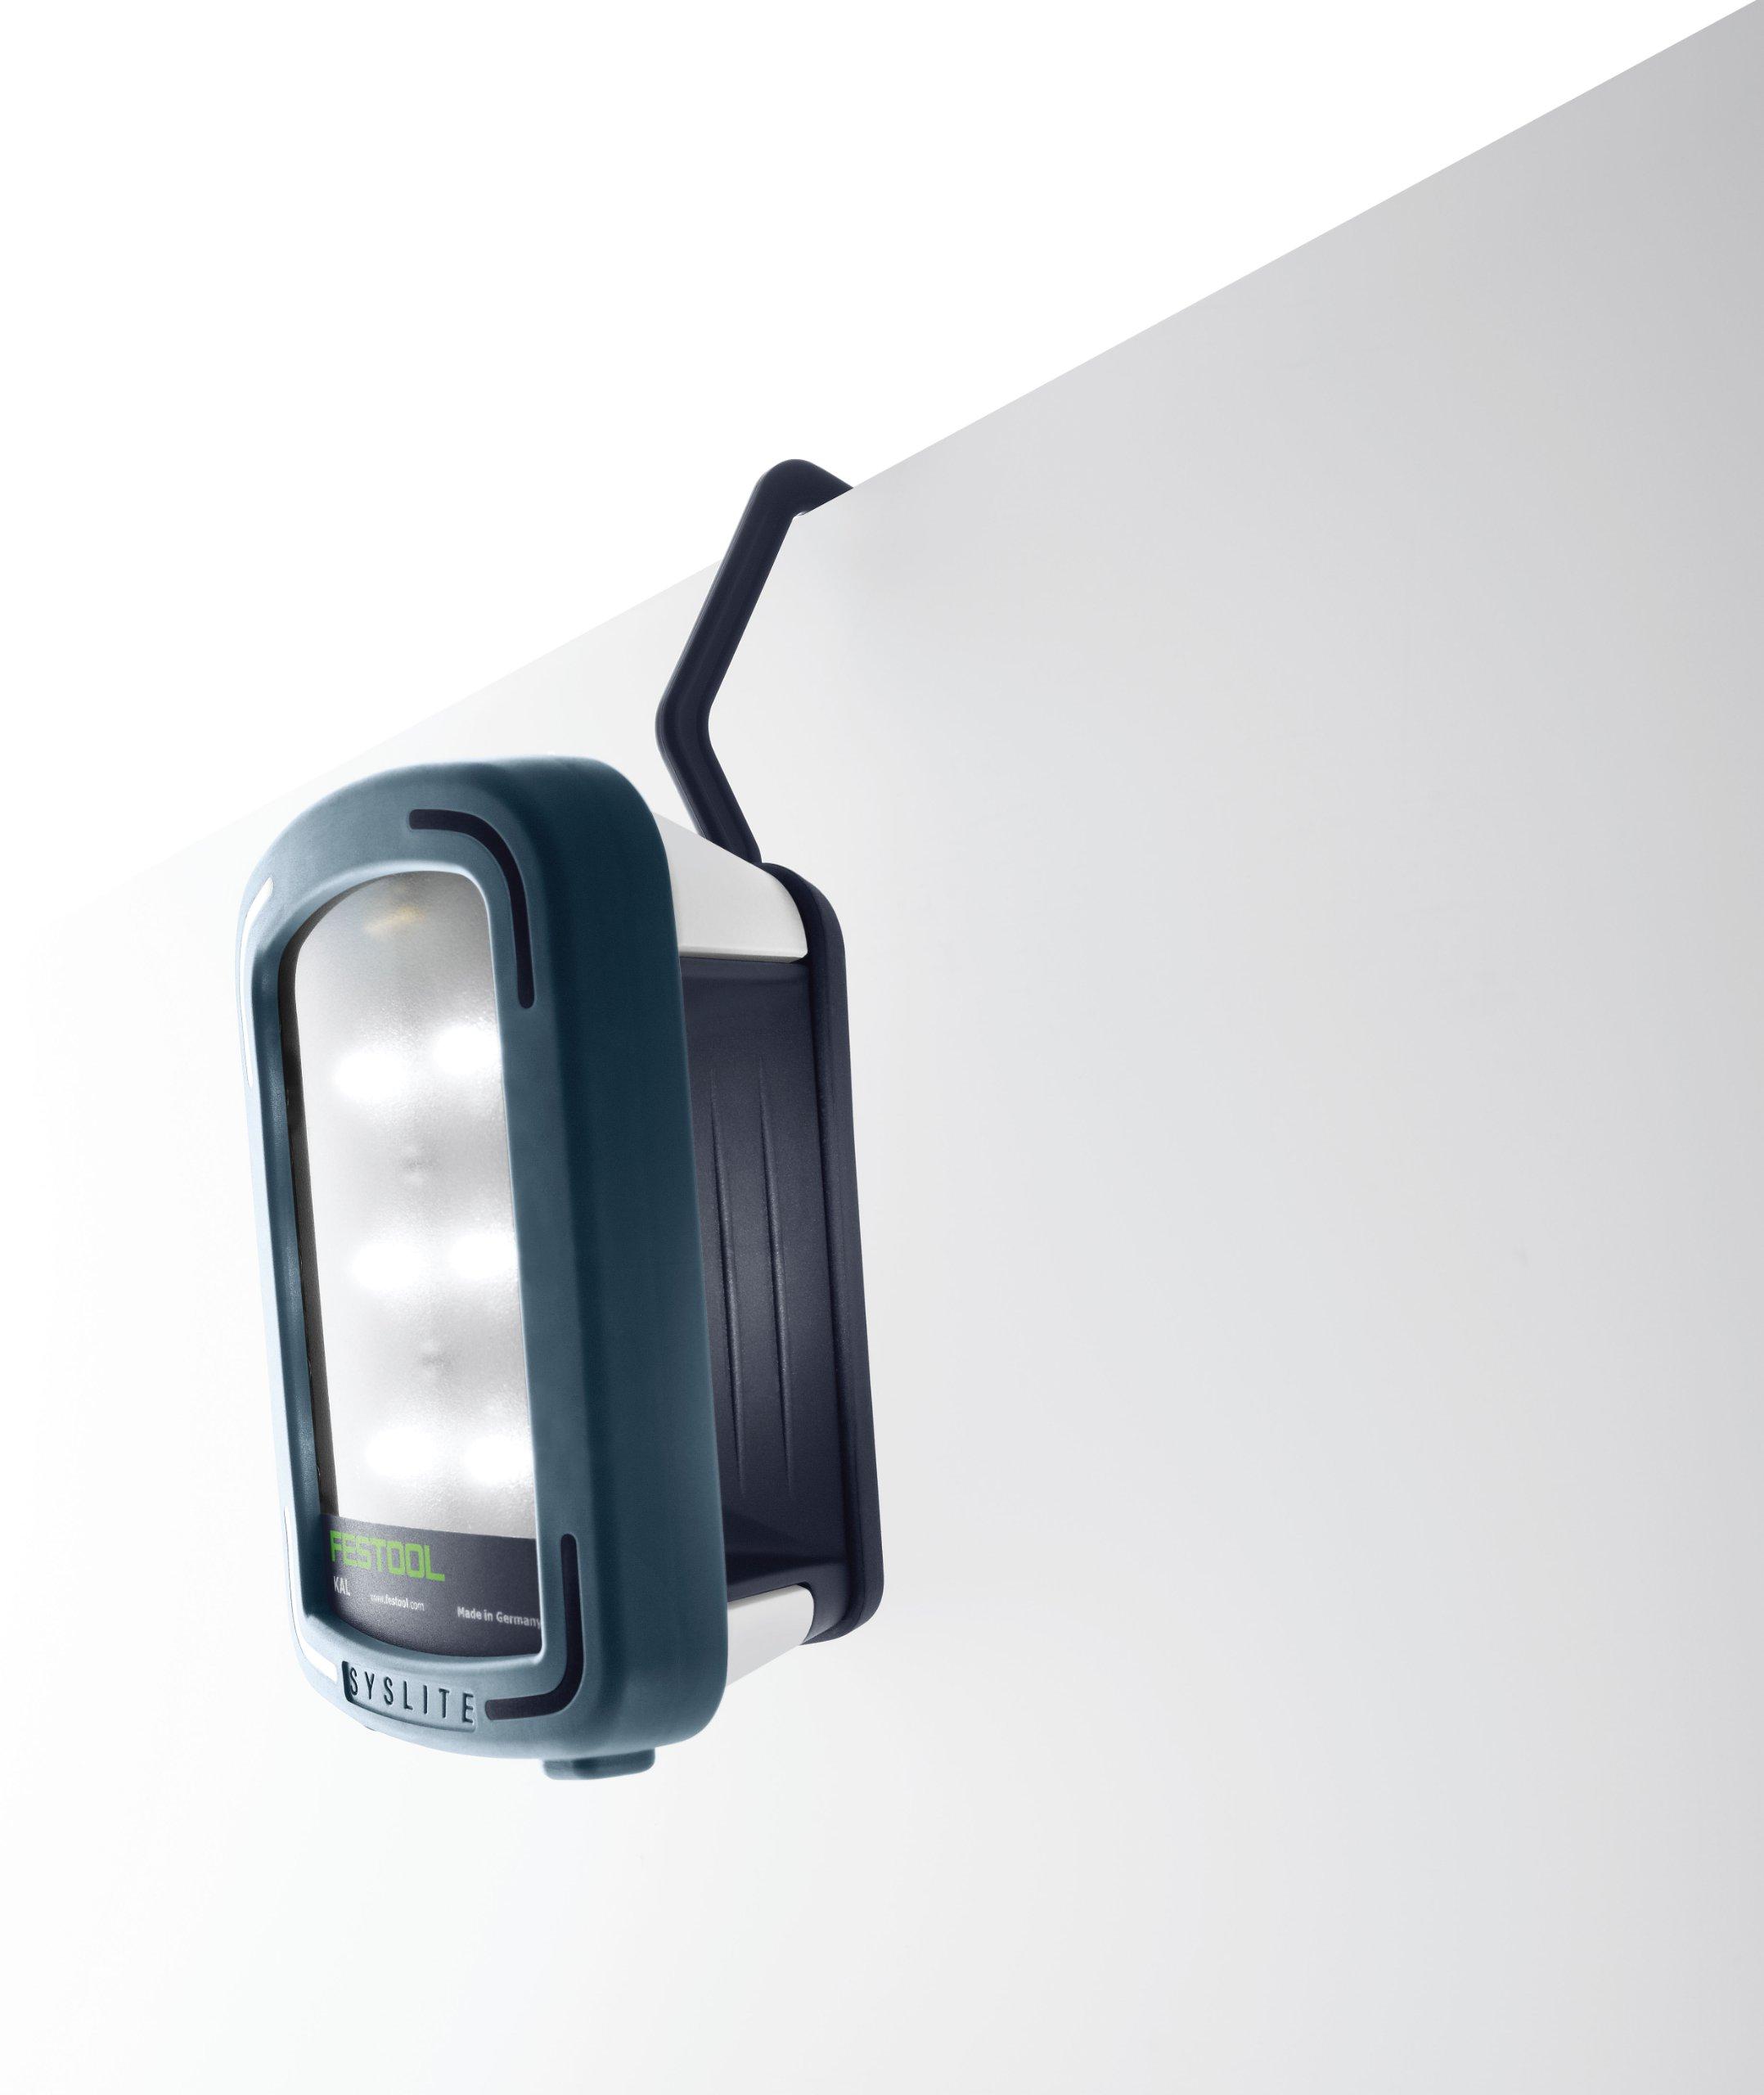 Festool 498568 SysLite LED Work Lamp by Festool (Image #1)